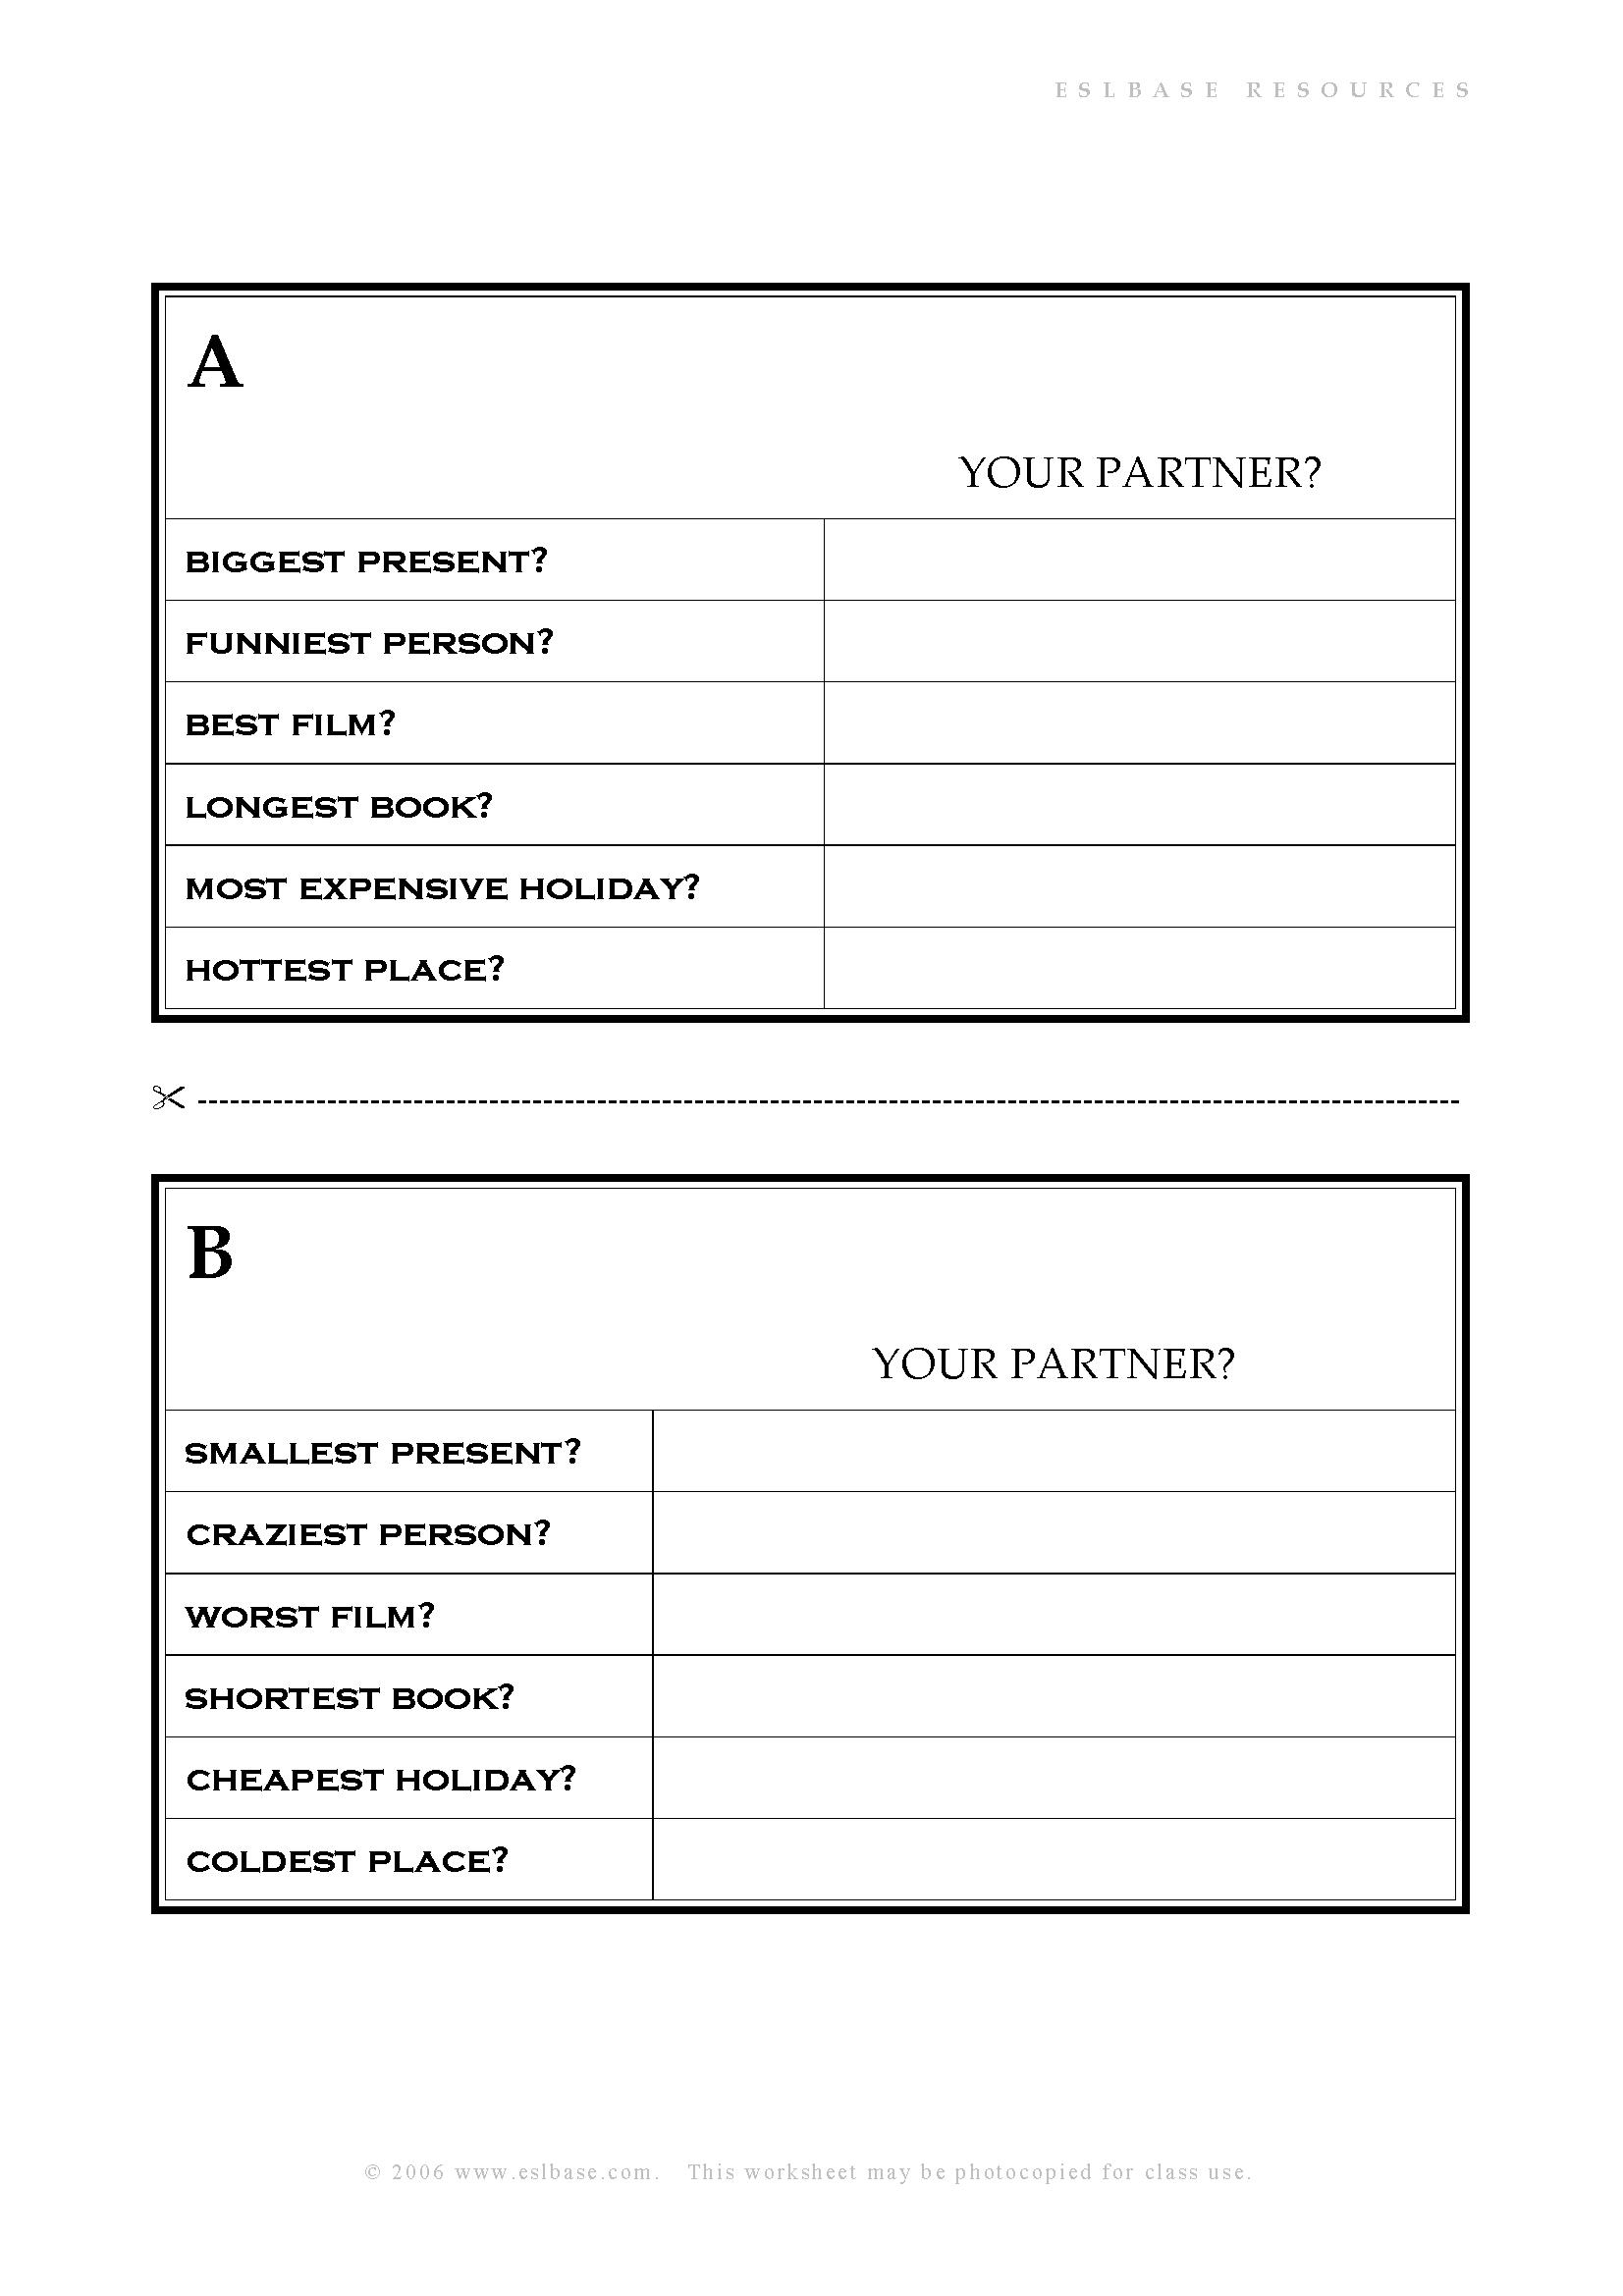 Superlative Adjectives Questionnaire